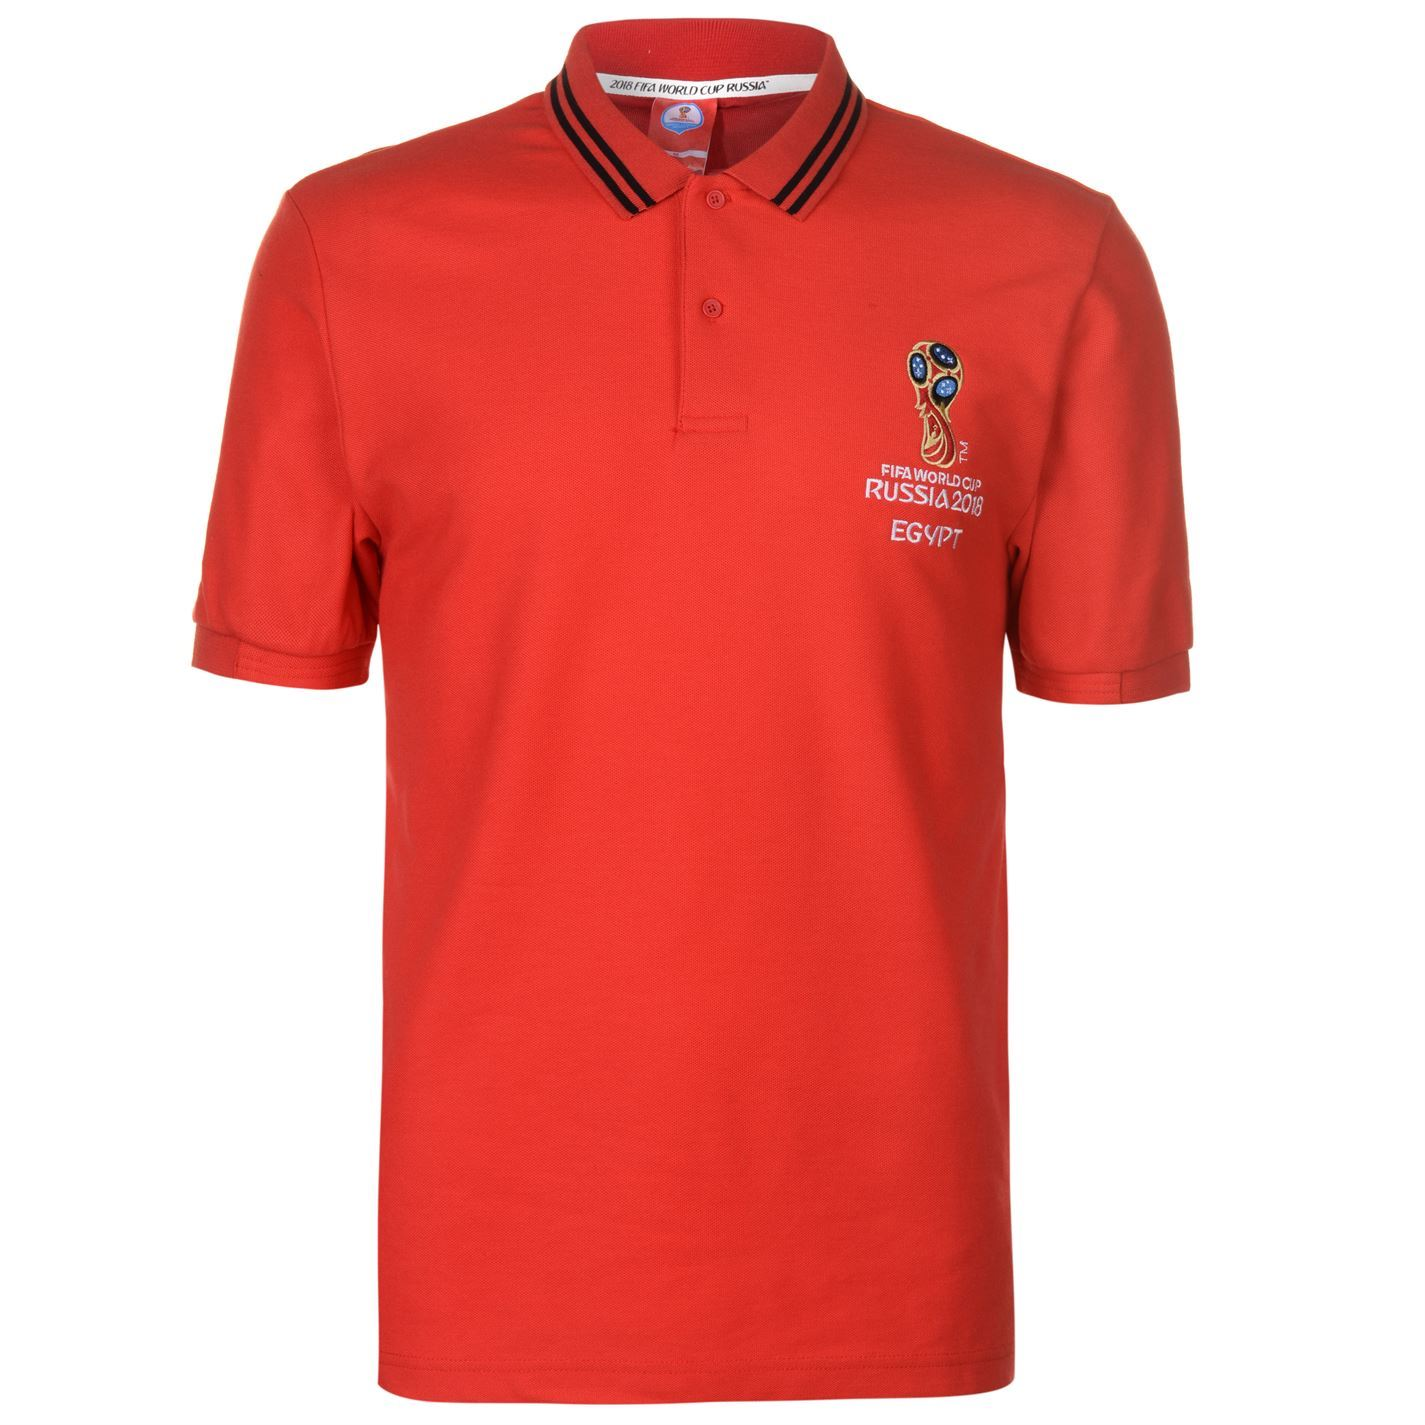 5ba55bd50 FIFA Mens World Cup Russia 2018 Egypt Polo Football Shirt Tee Top ...